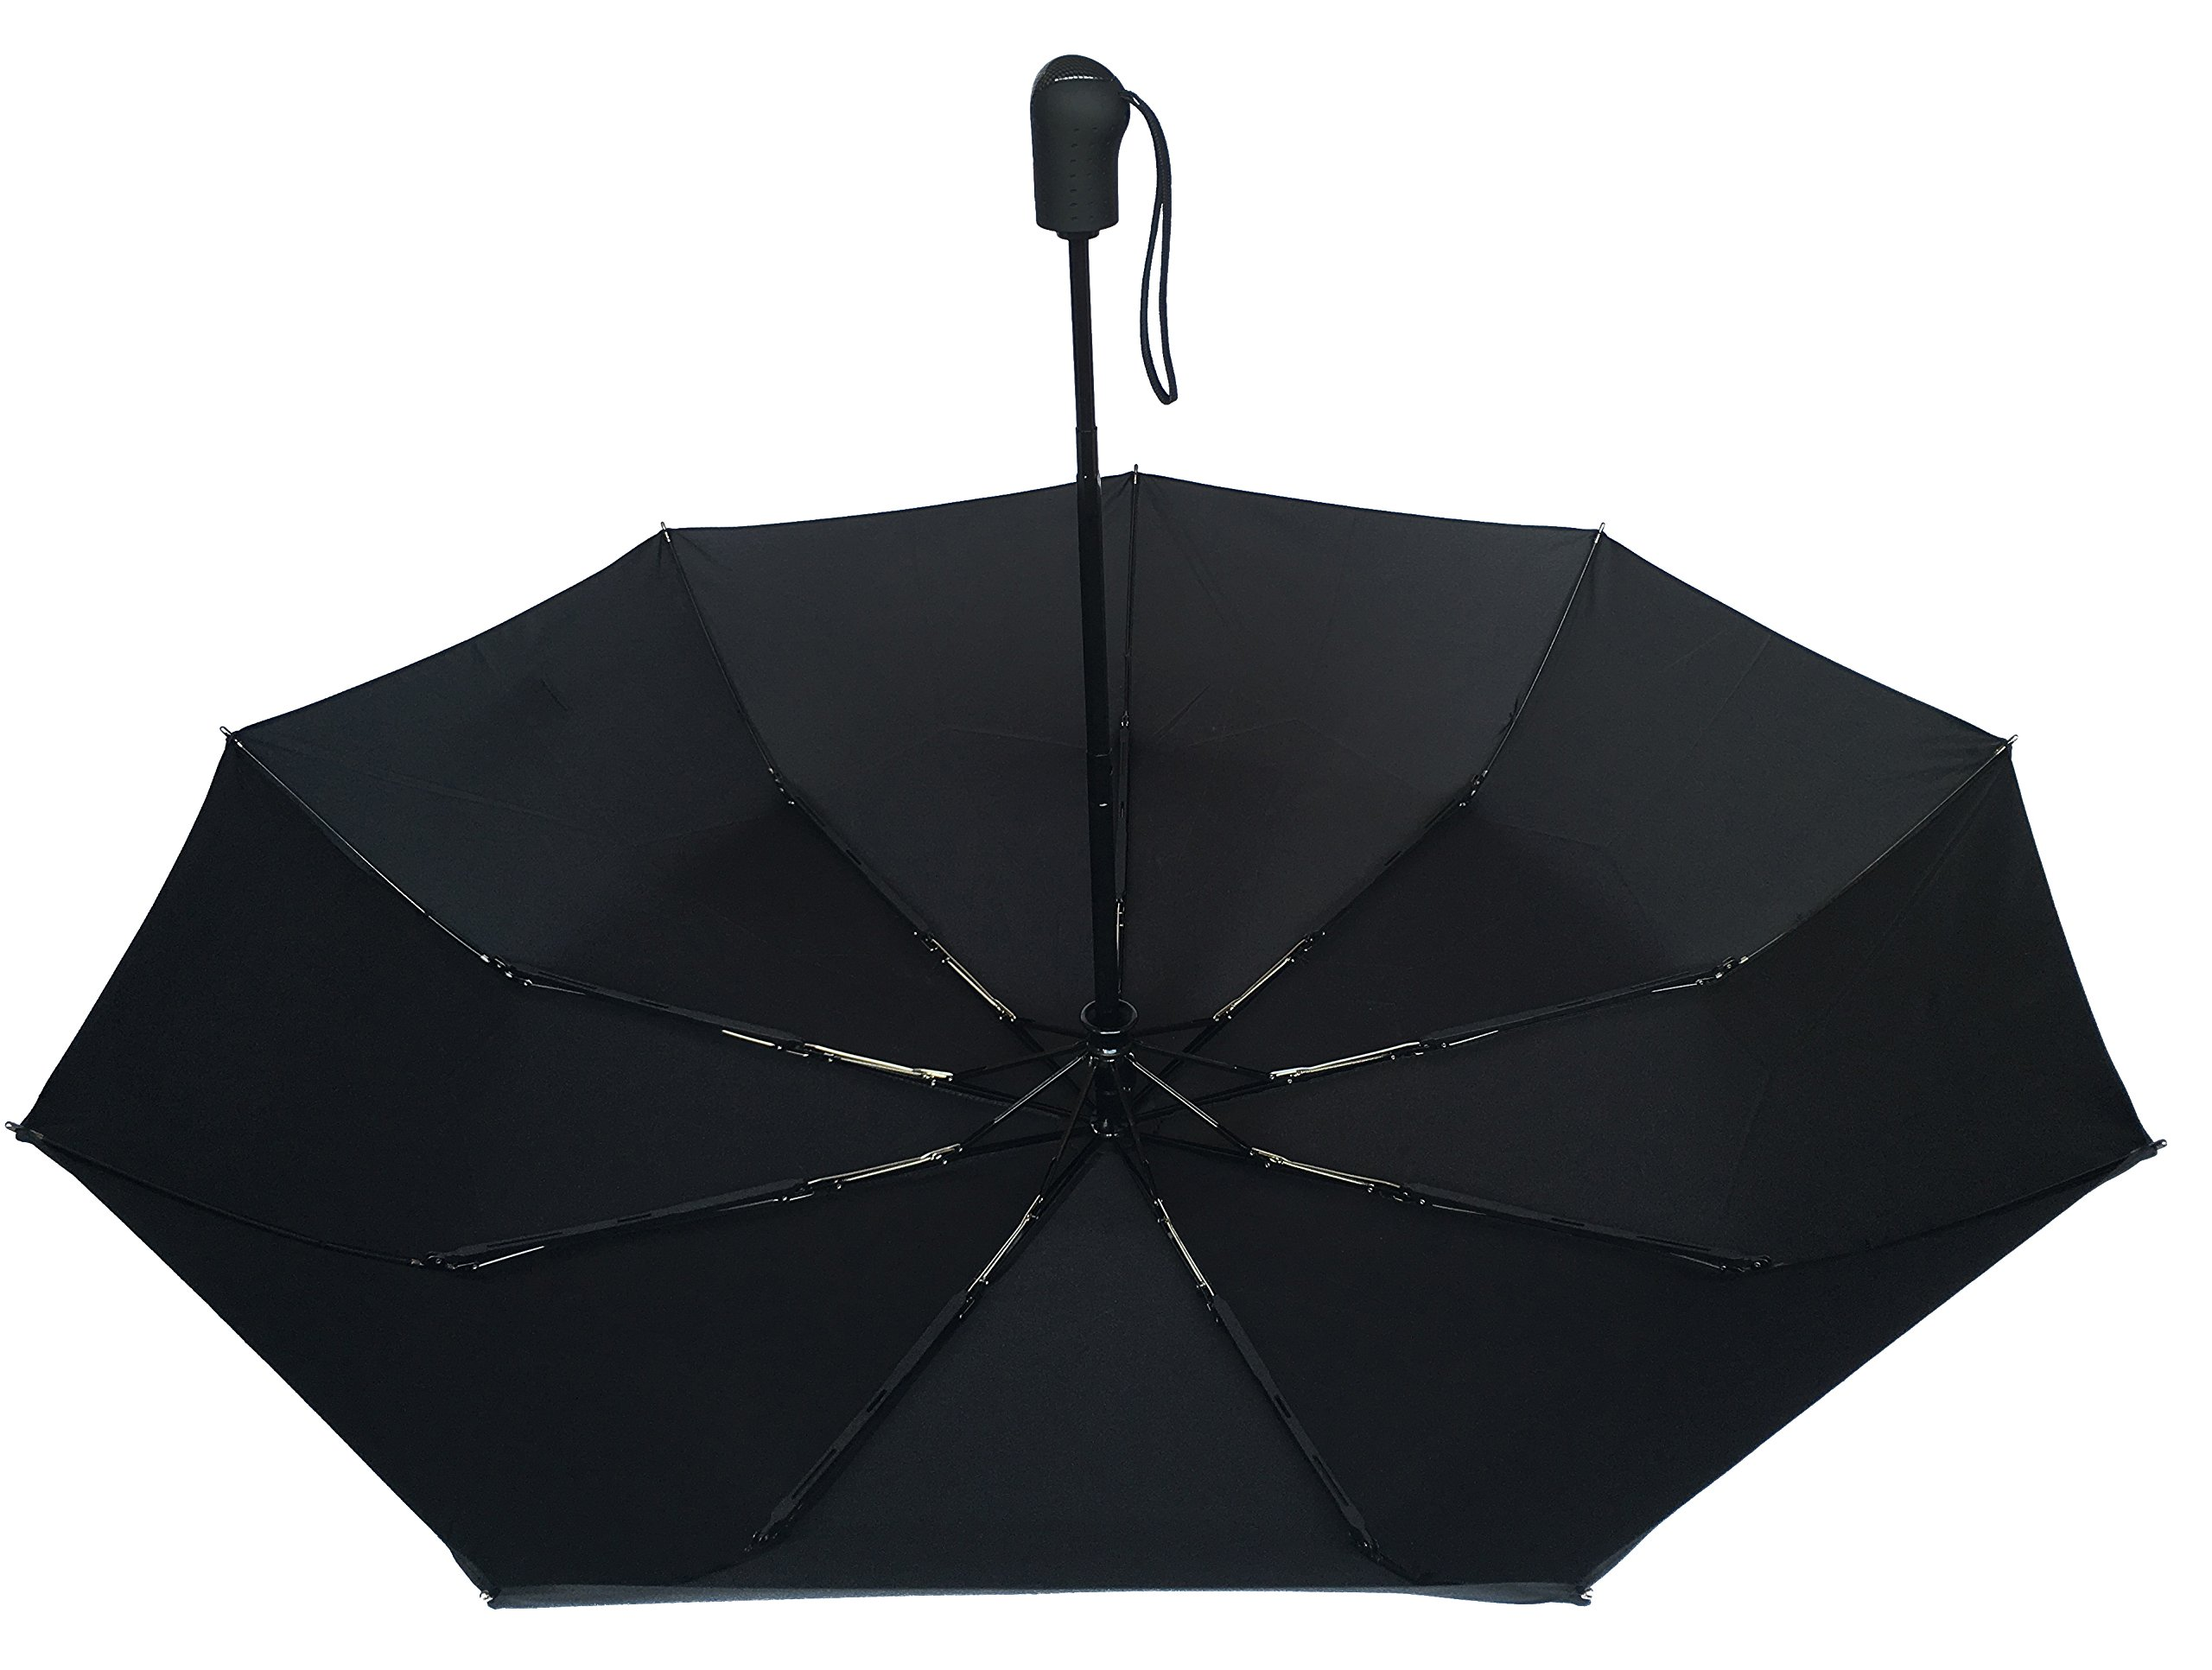 Umenice Auto Open And Closed travel umbrella 9 Ribs Black by Umenice (Image #6)